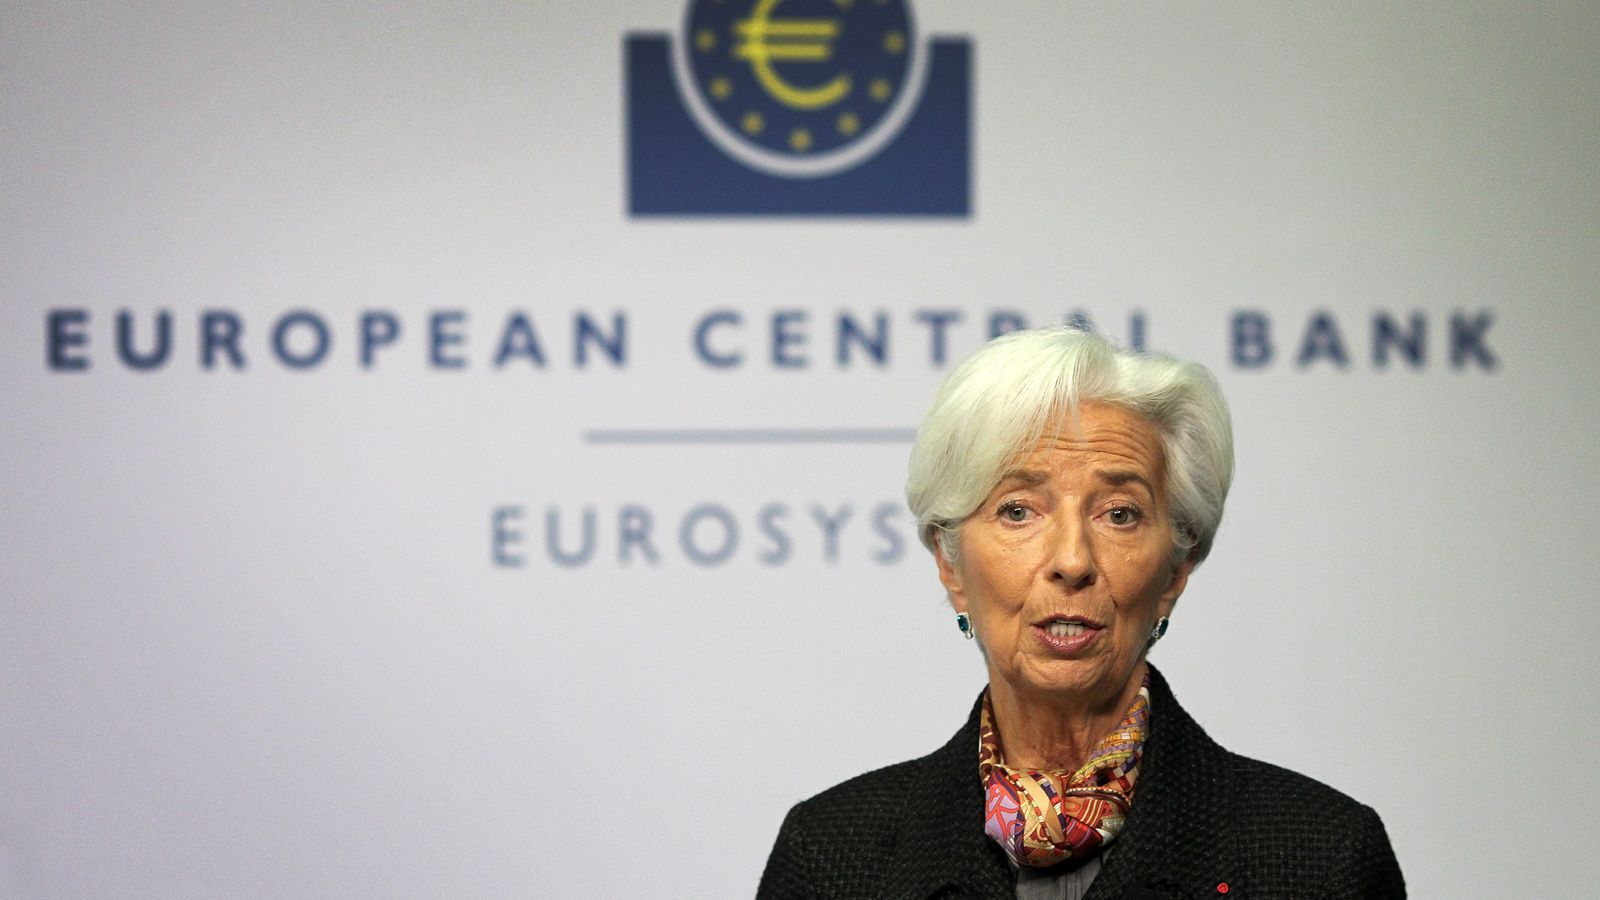 La presidenta del BCE, Christine Lagarde, en una imatge d'arxiu.